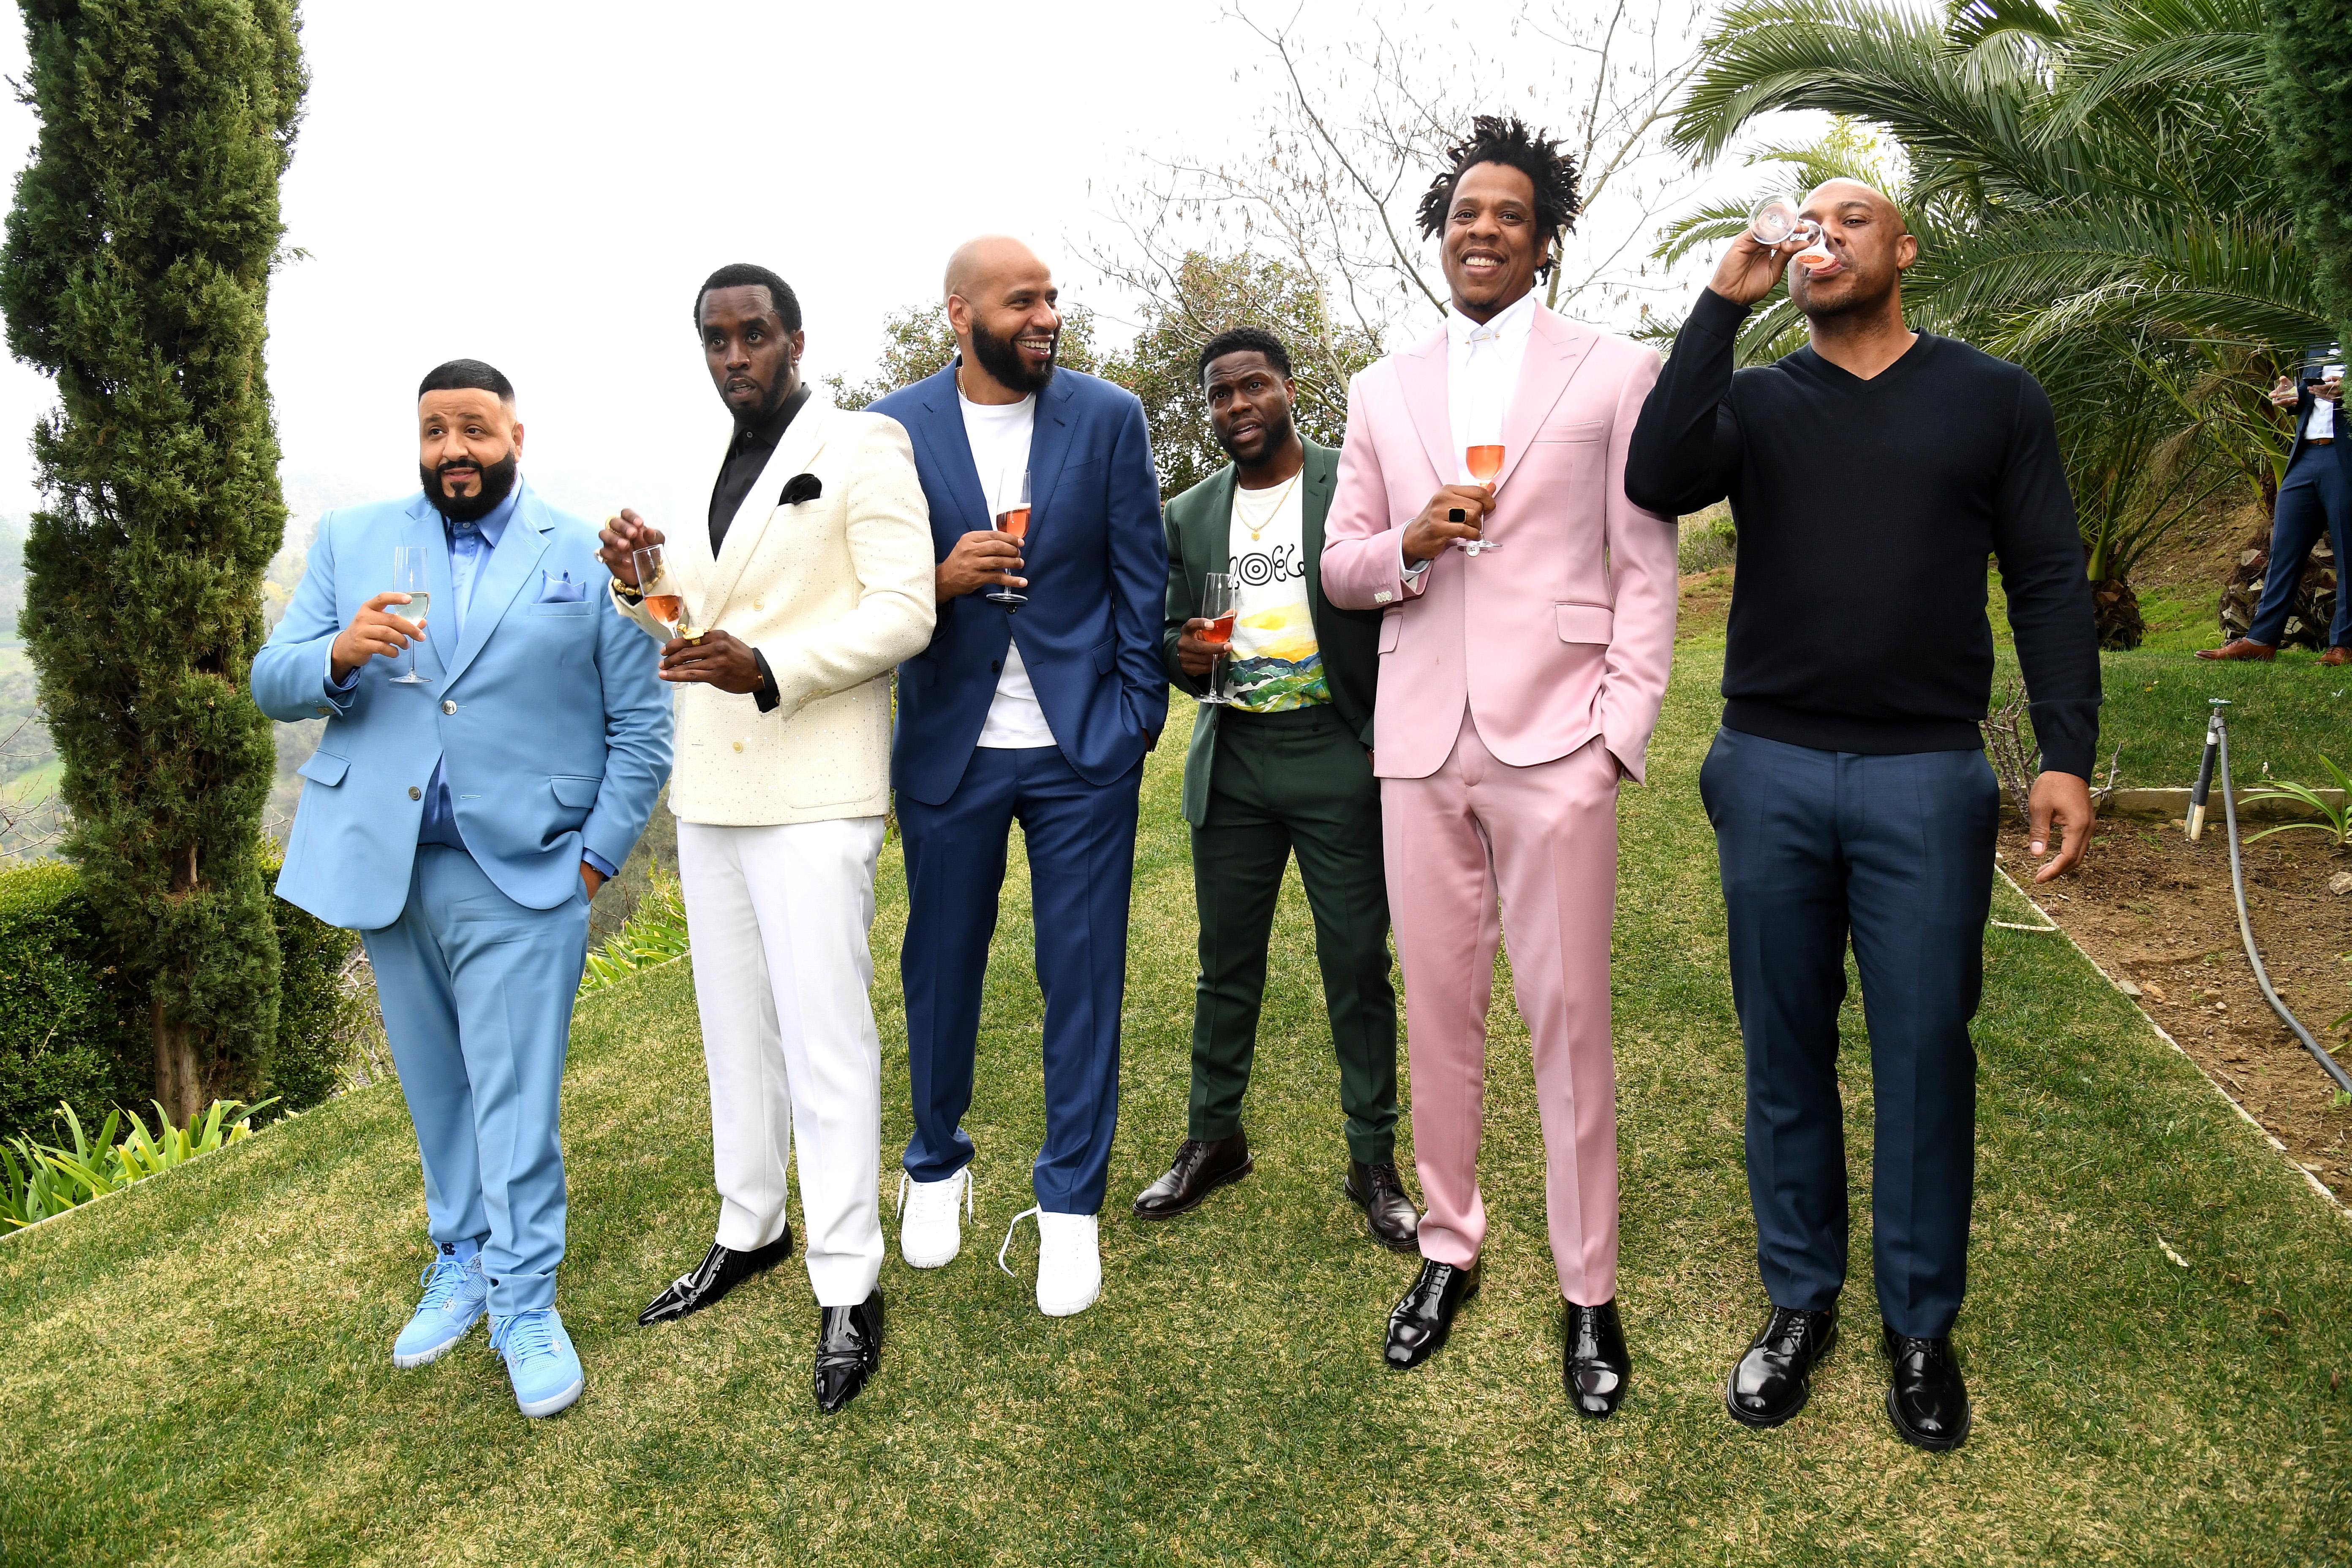 Roc Nation Brunch 2020